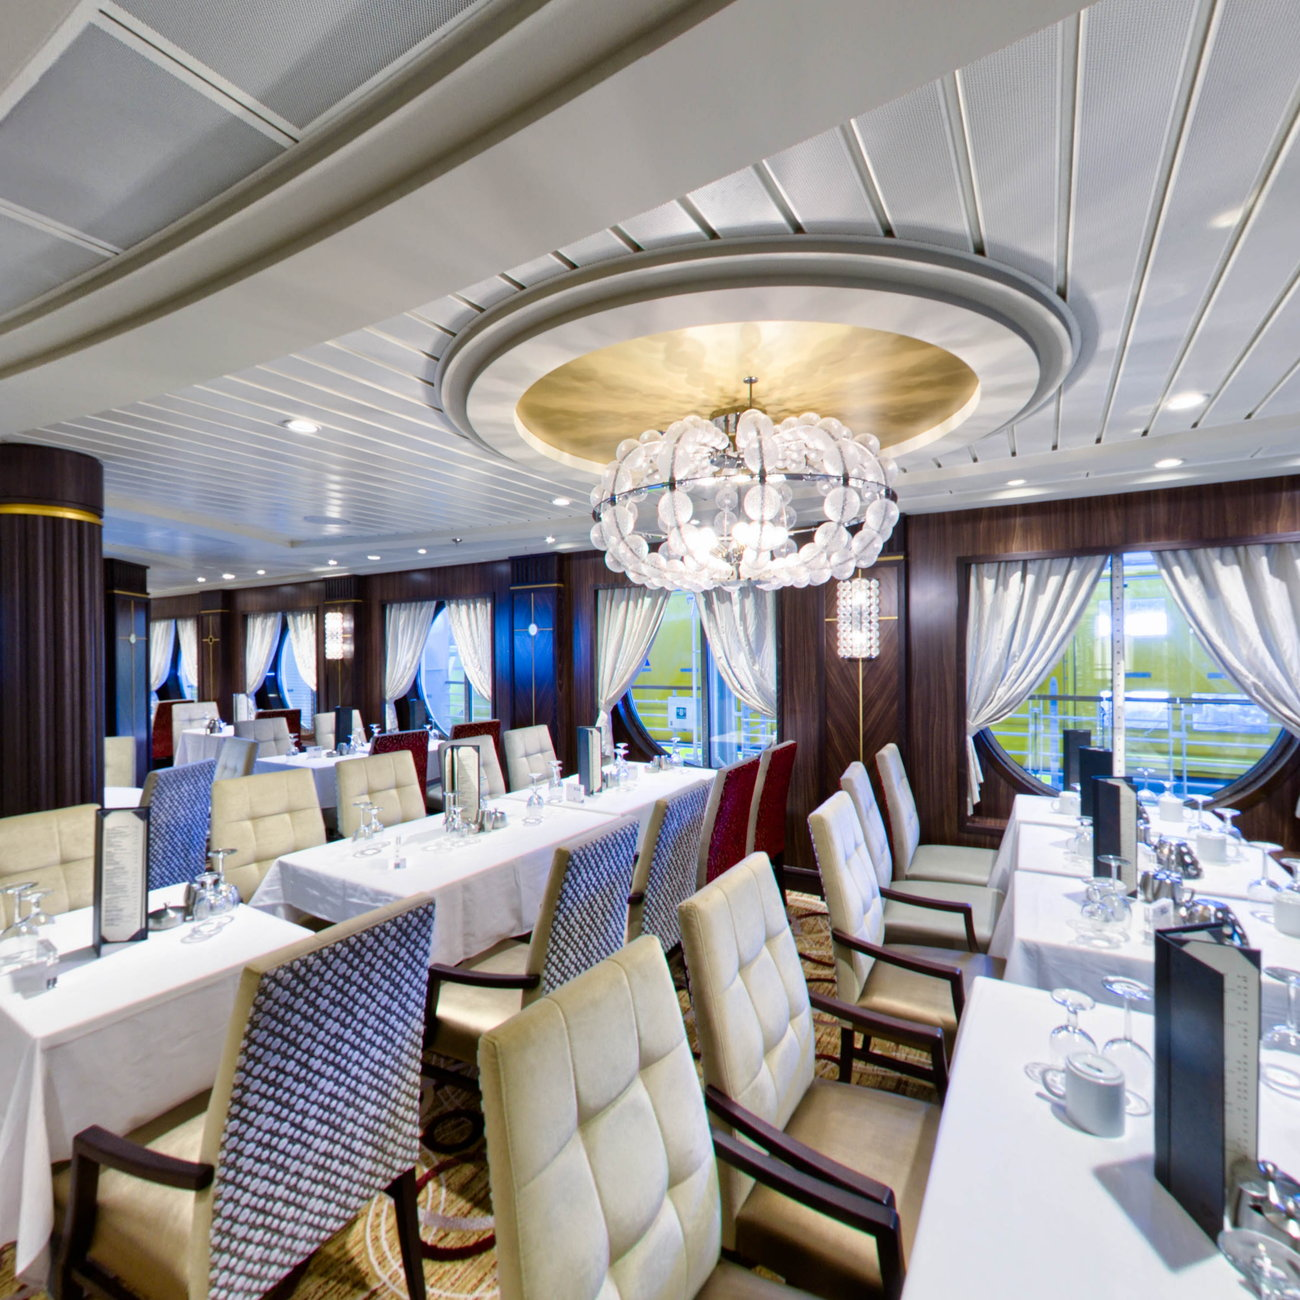 Main Dining Room: Main Dining Room On Royal Caribbean Symphony Of The Seas